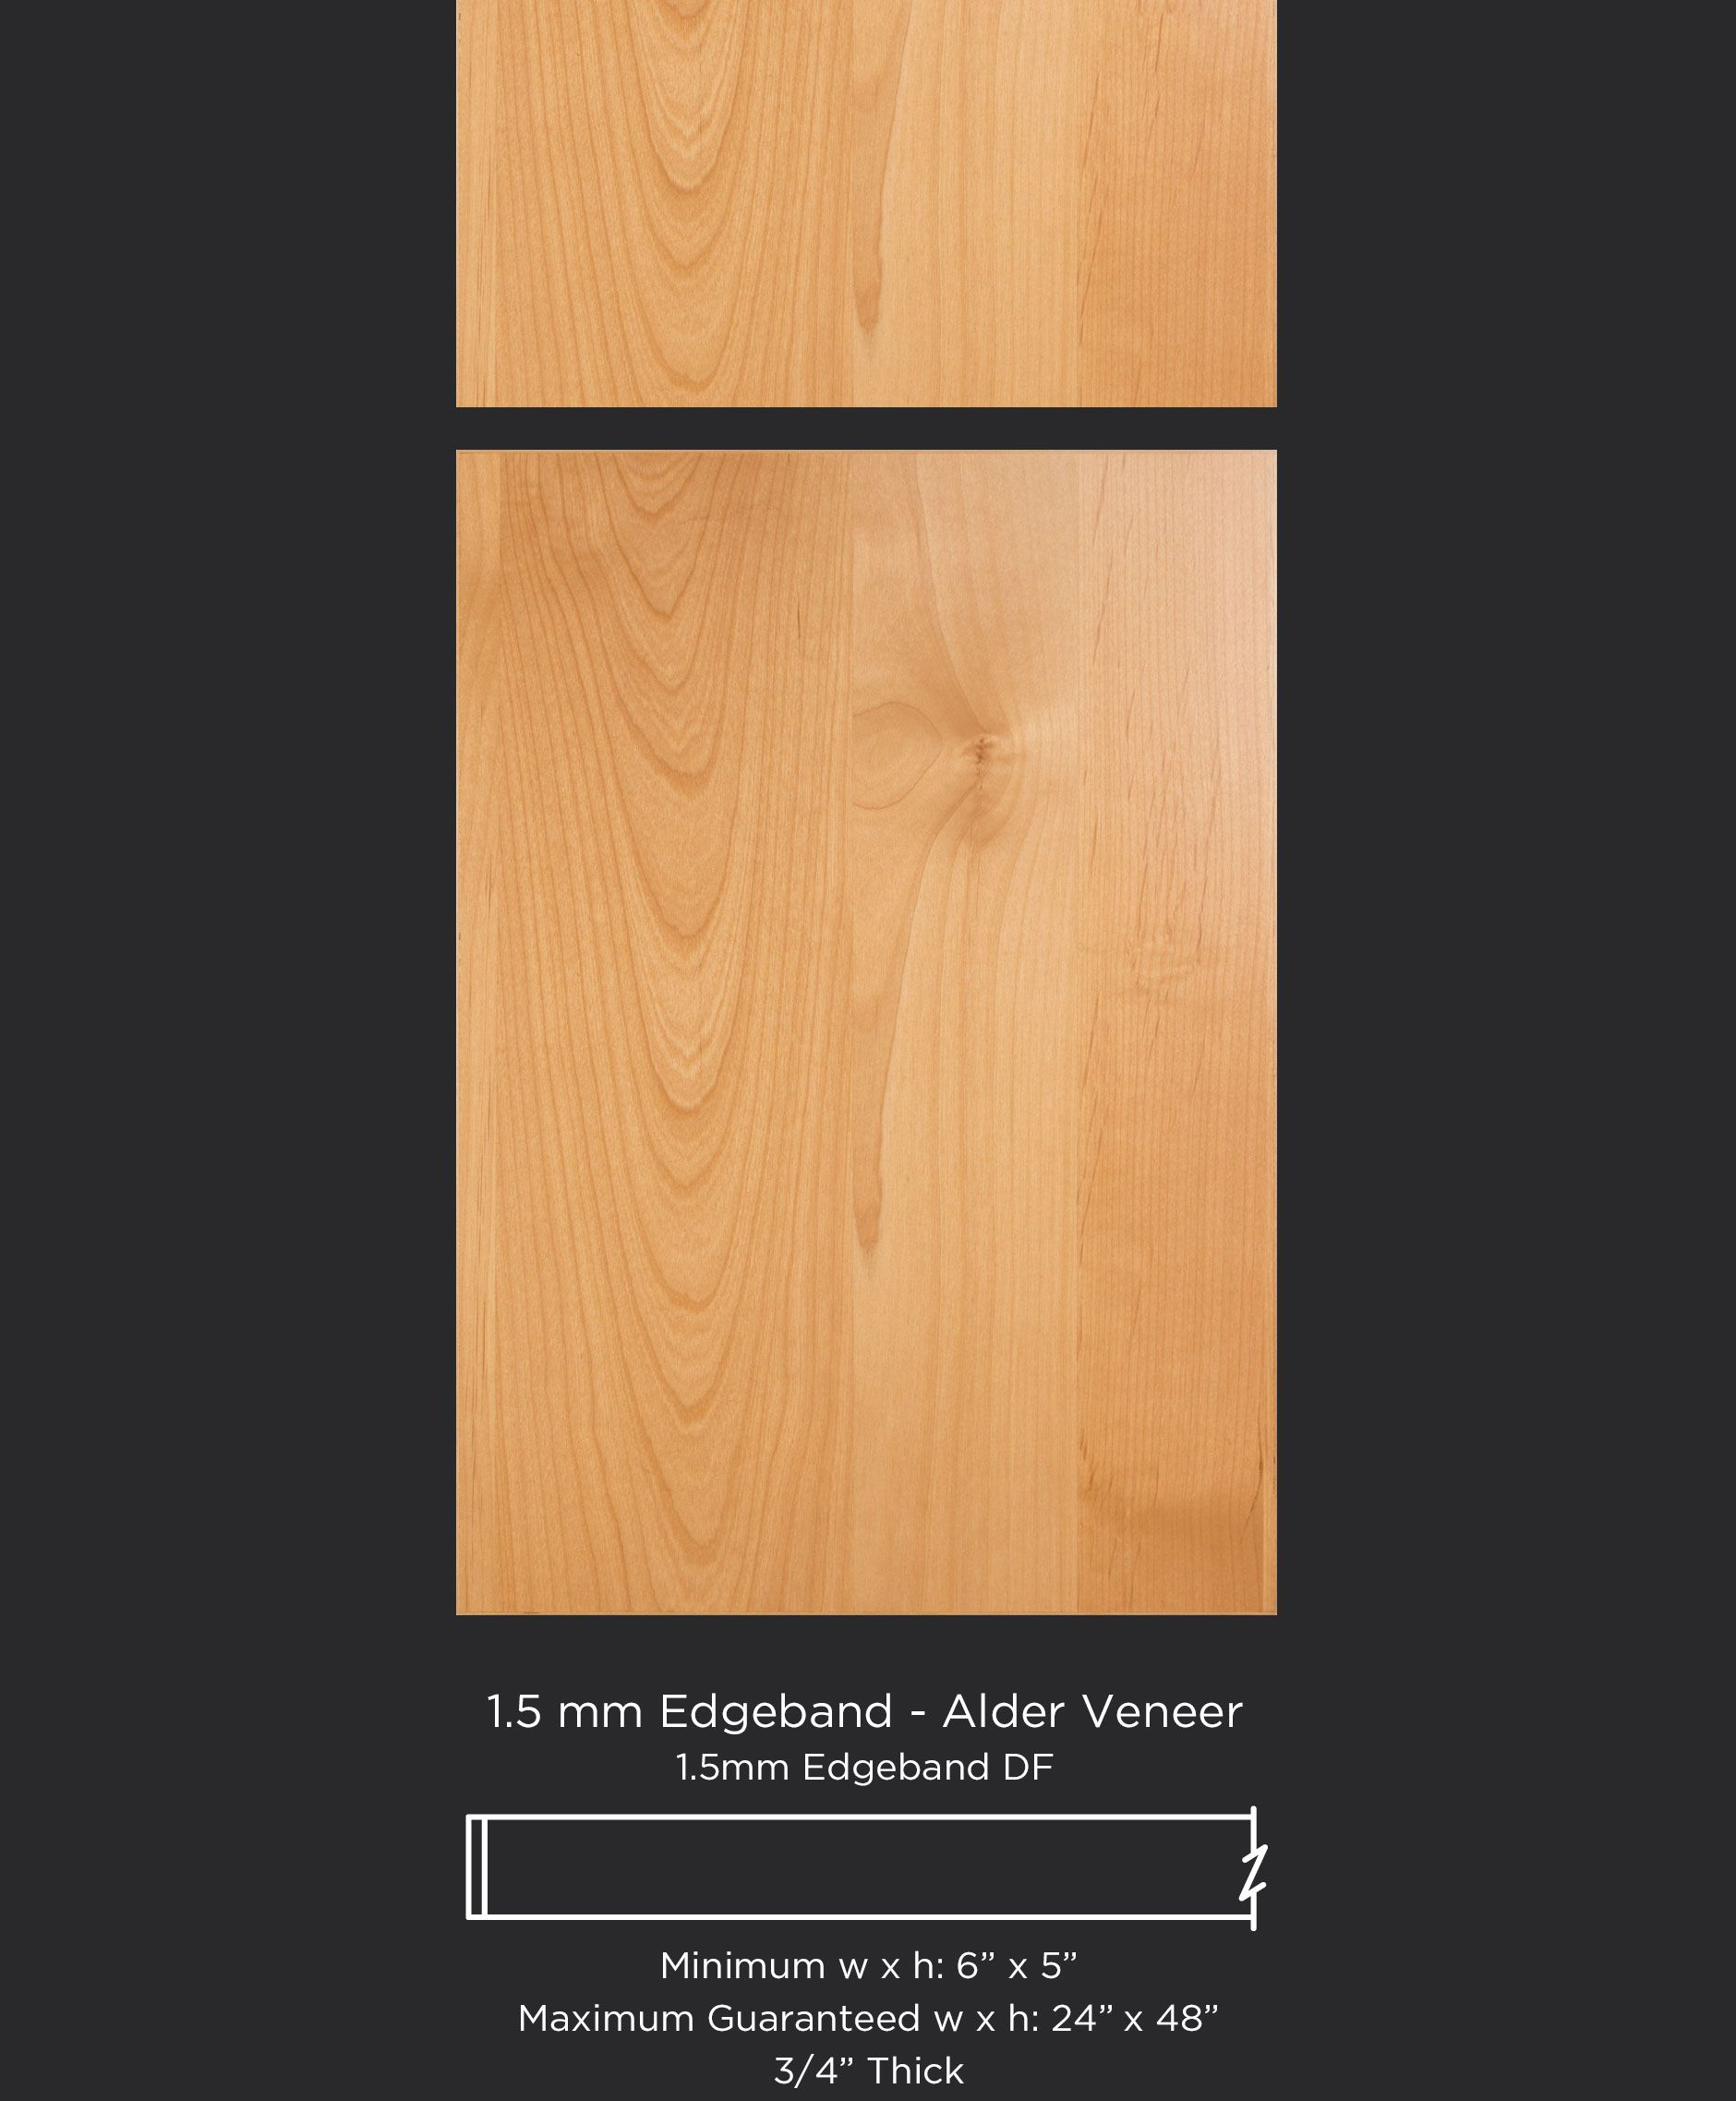 1 5 Mm Edgeband Alder Veneer Taylorcraft Cabinet Door Company Cabinet Doors Veneers Custom Cabinet Doors